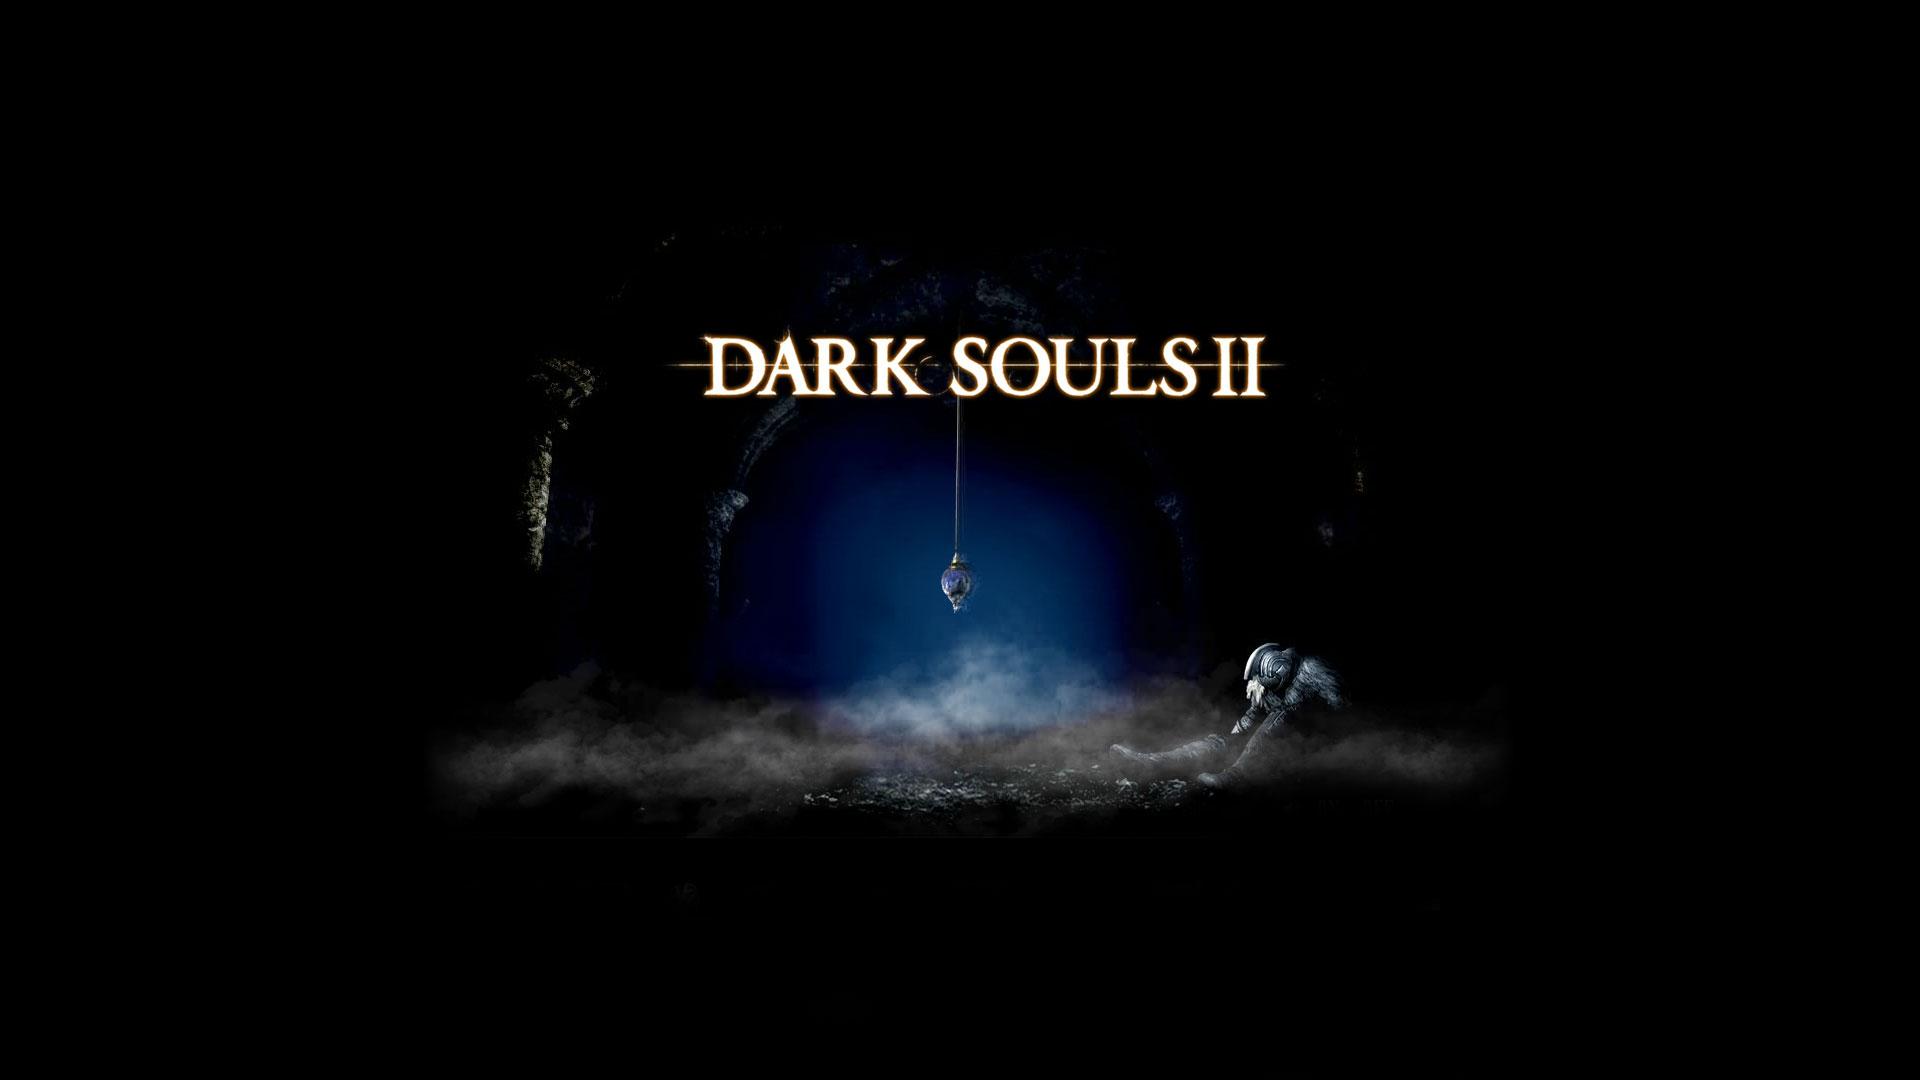 Dark Souls 2 wallpaper 242149 1920x1080